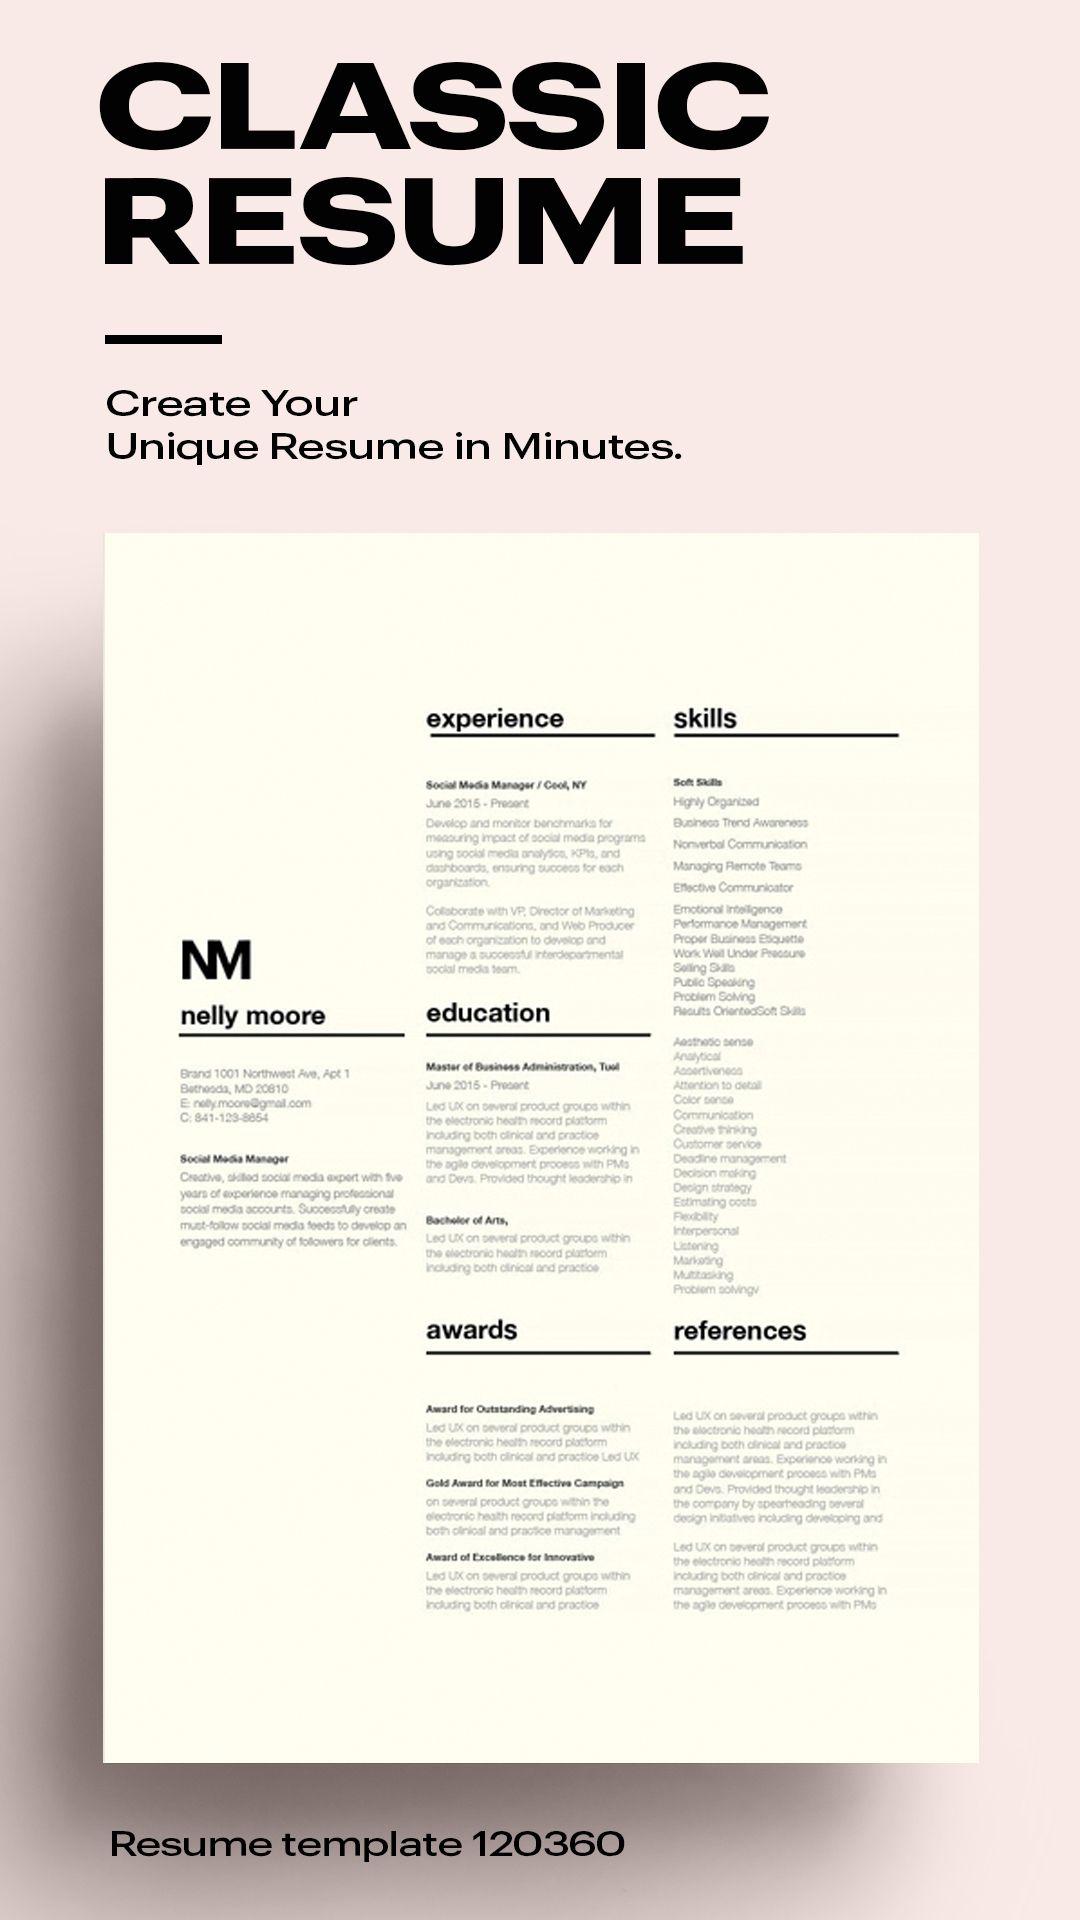 Classic Resume Template [120360] Resume, Resume words